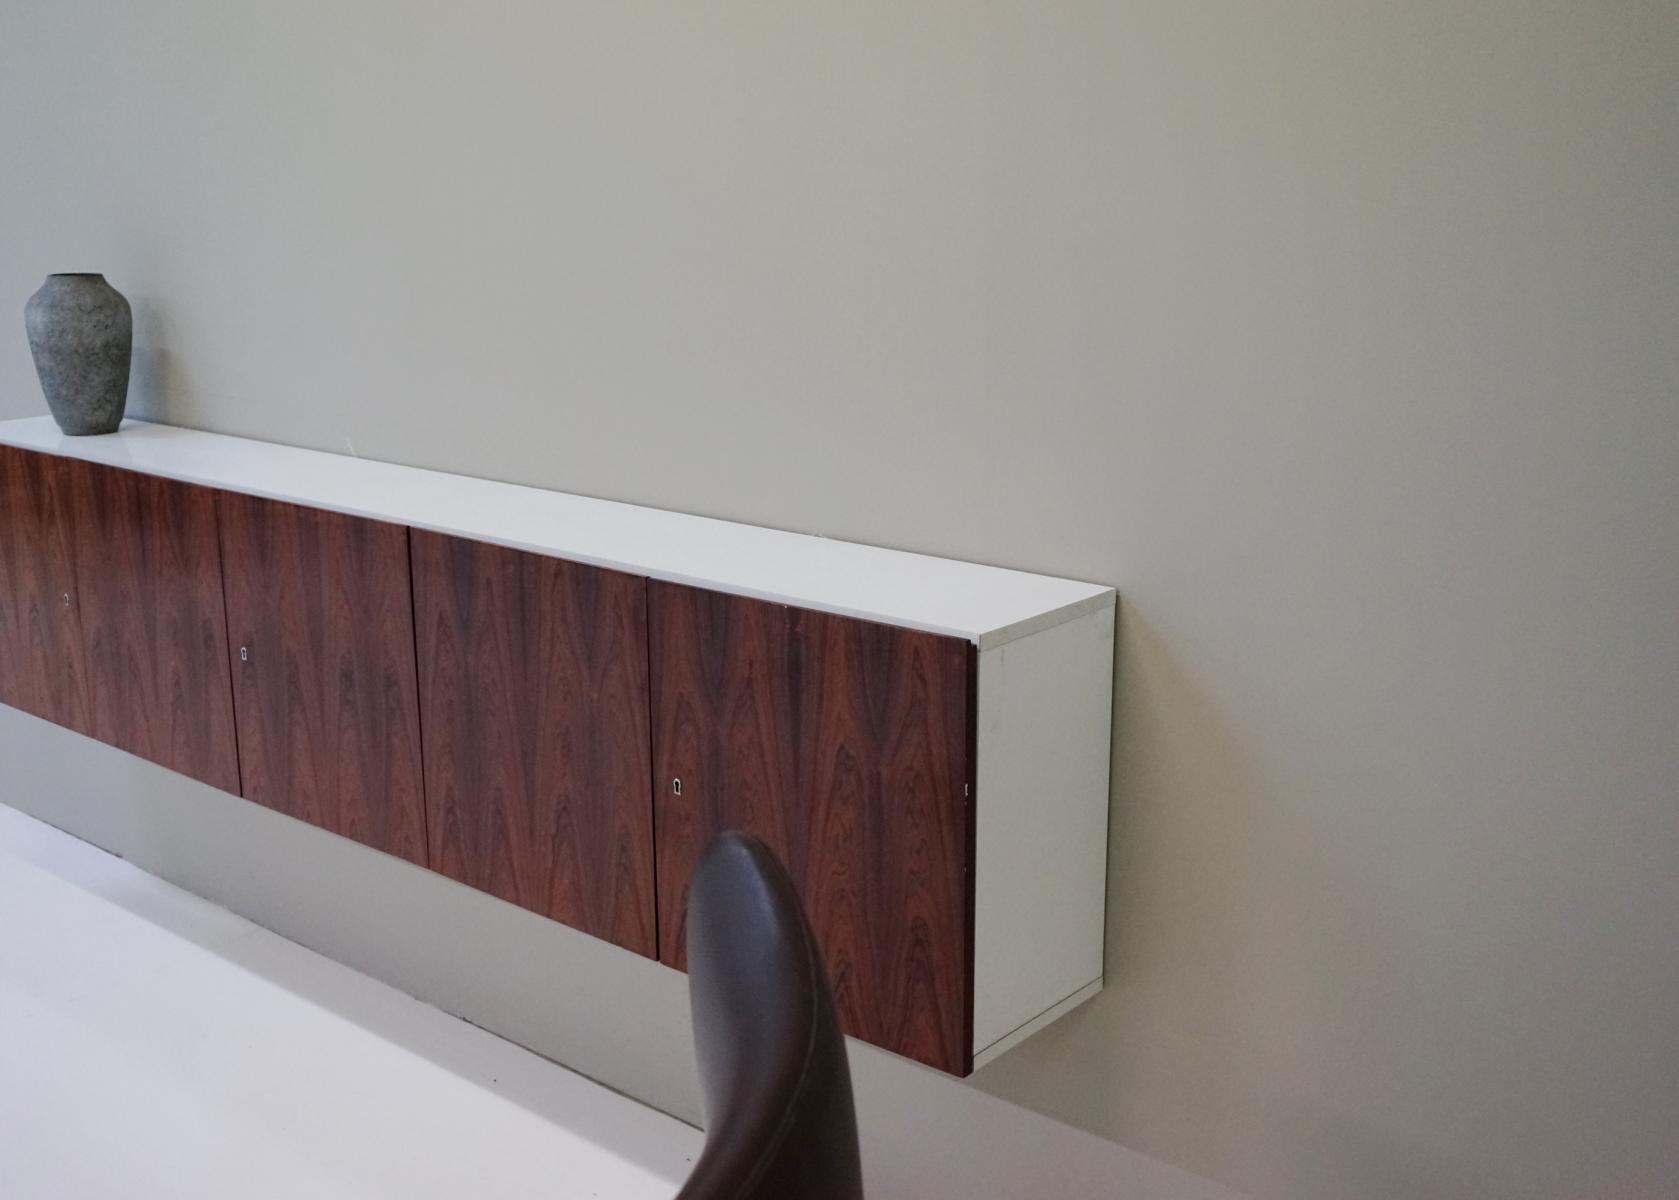 rosewood sideboard from rve rincklake van endert 1965 for sale at pamono. Black Bedroom Furniture Sets. Home Design Ideas